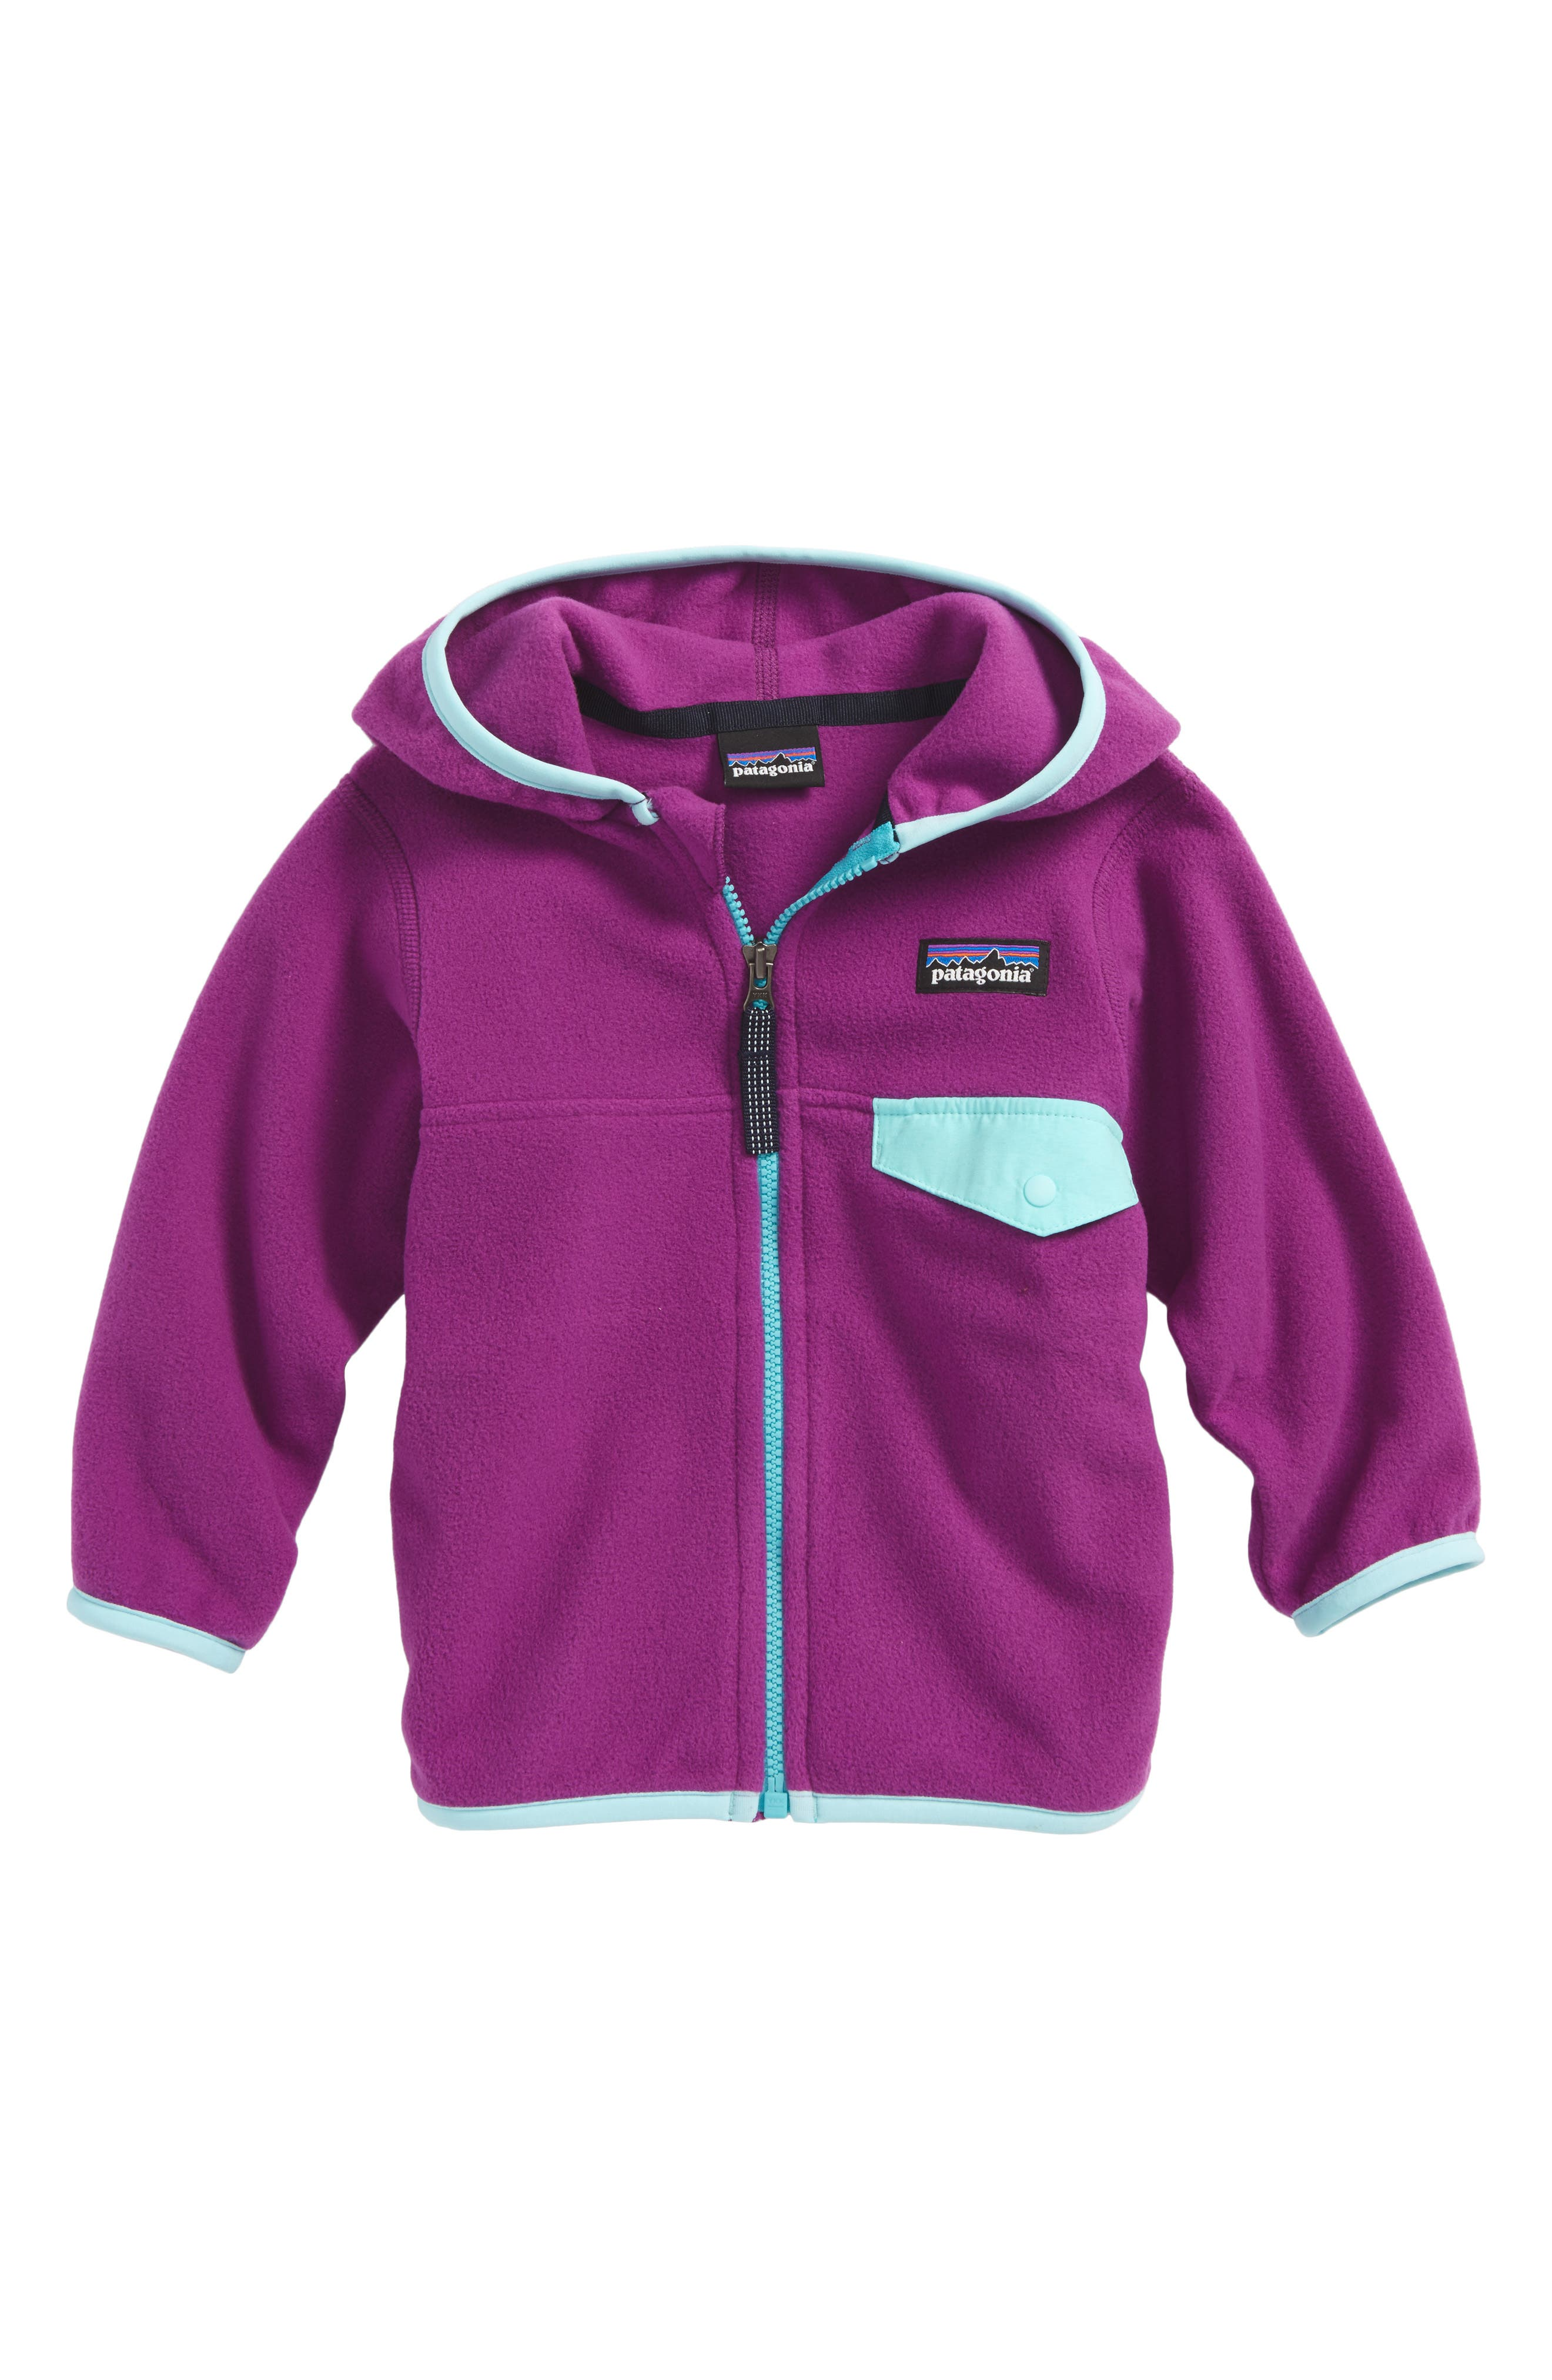 Micro D<sup>®</sup> Snap-T<sup>®</sup> Fleece Jacket,                             Main thumbnail 1, color,                             Ikp Ikat Purple